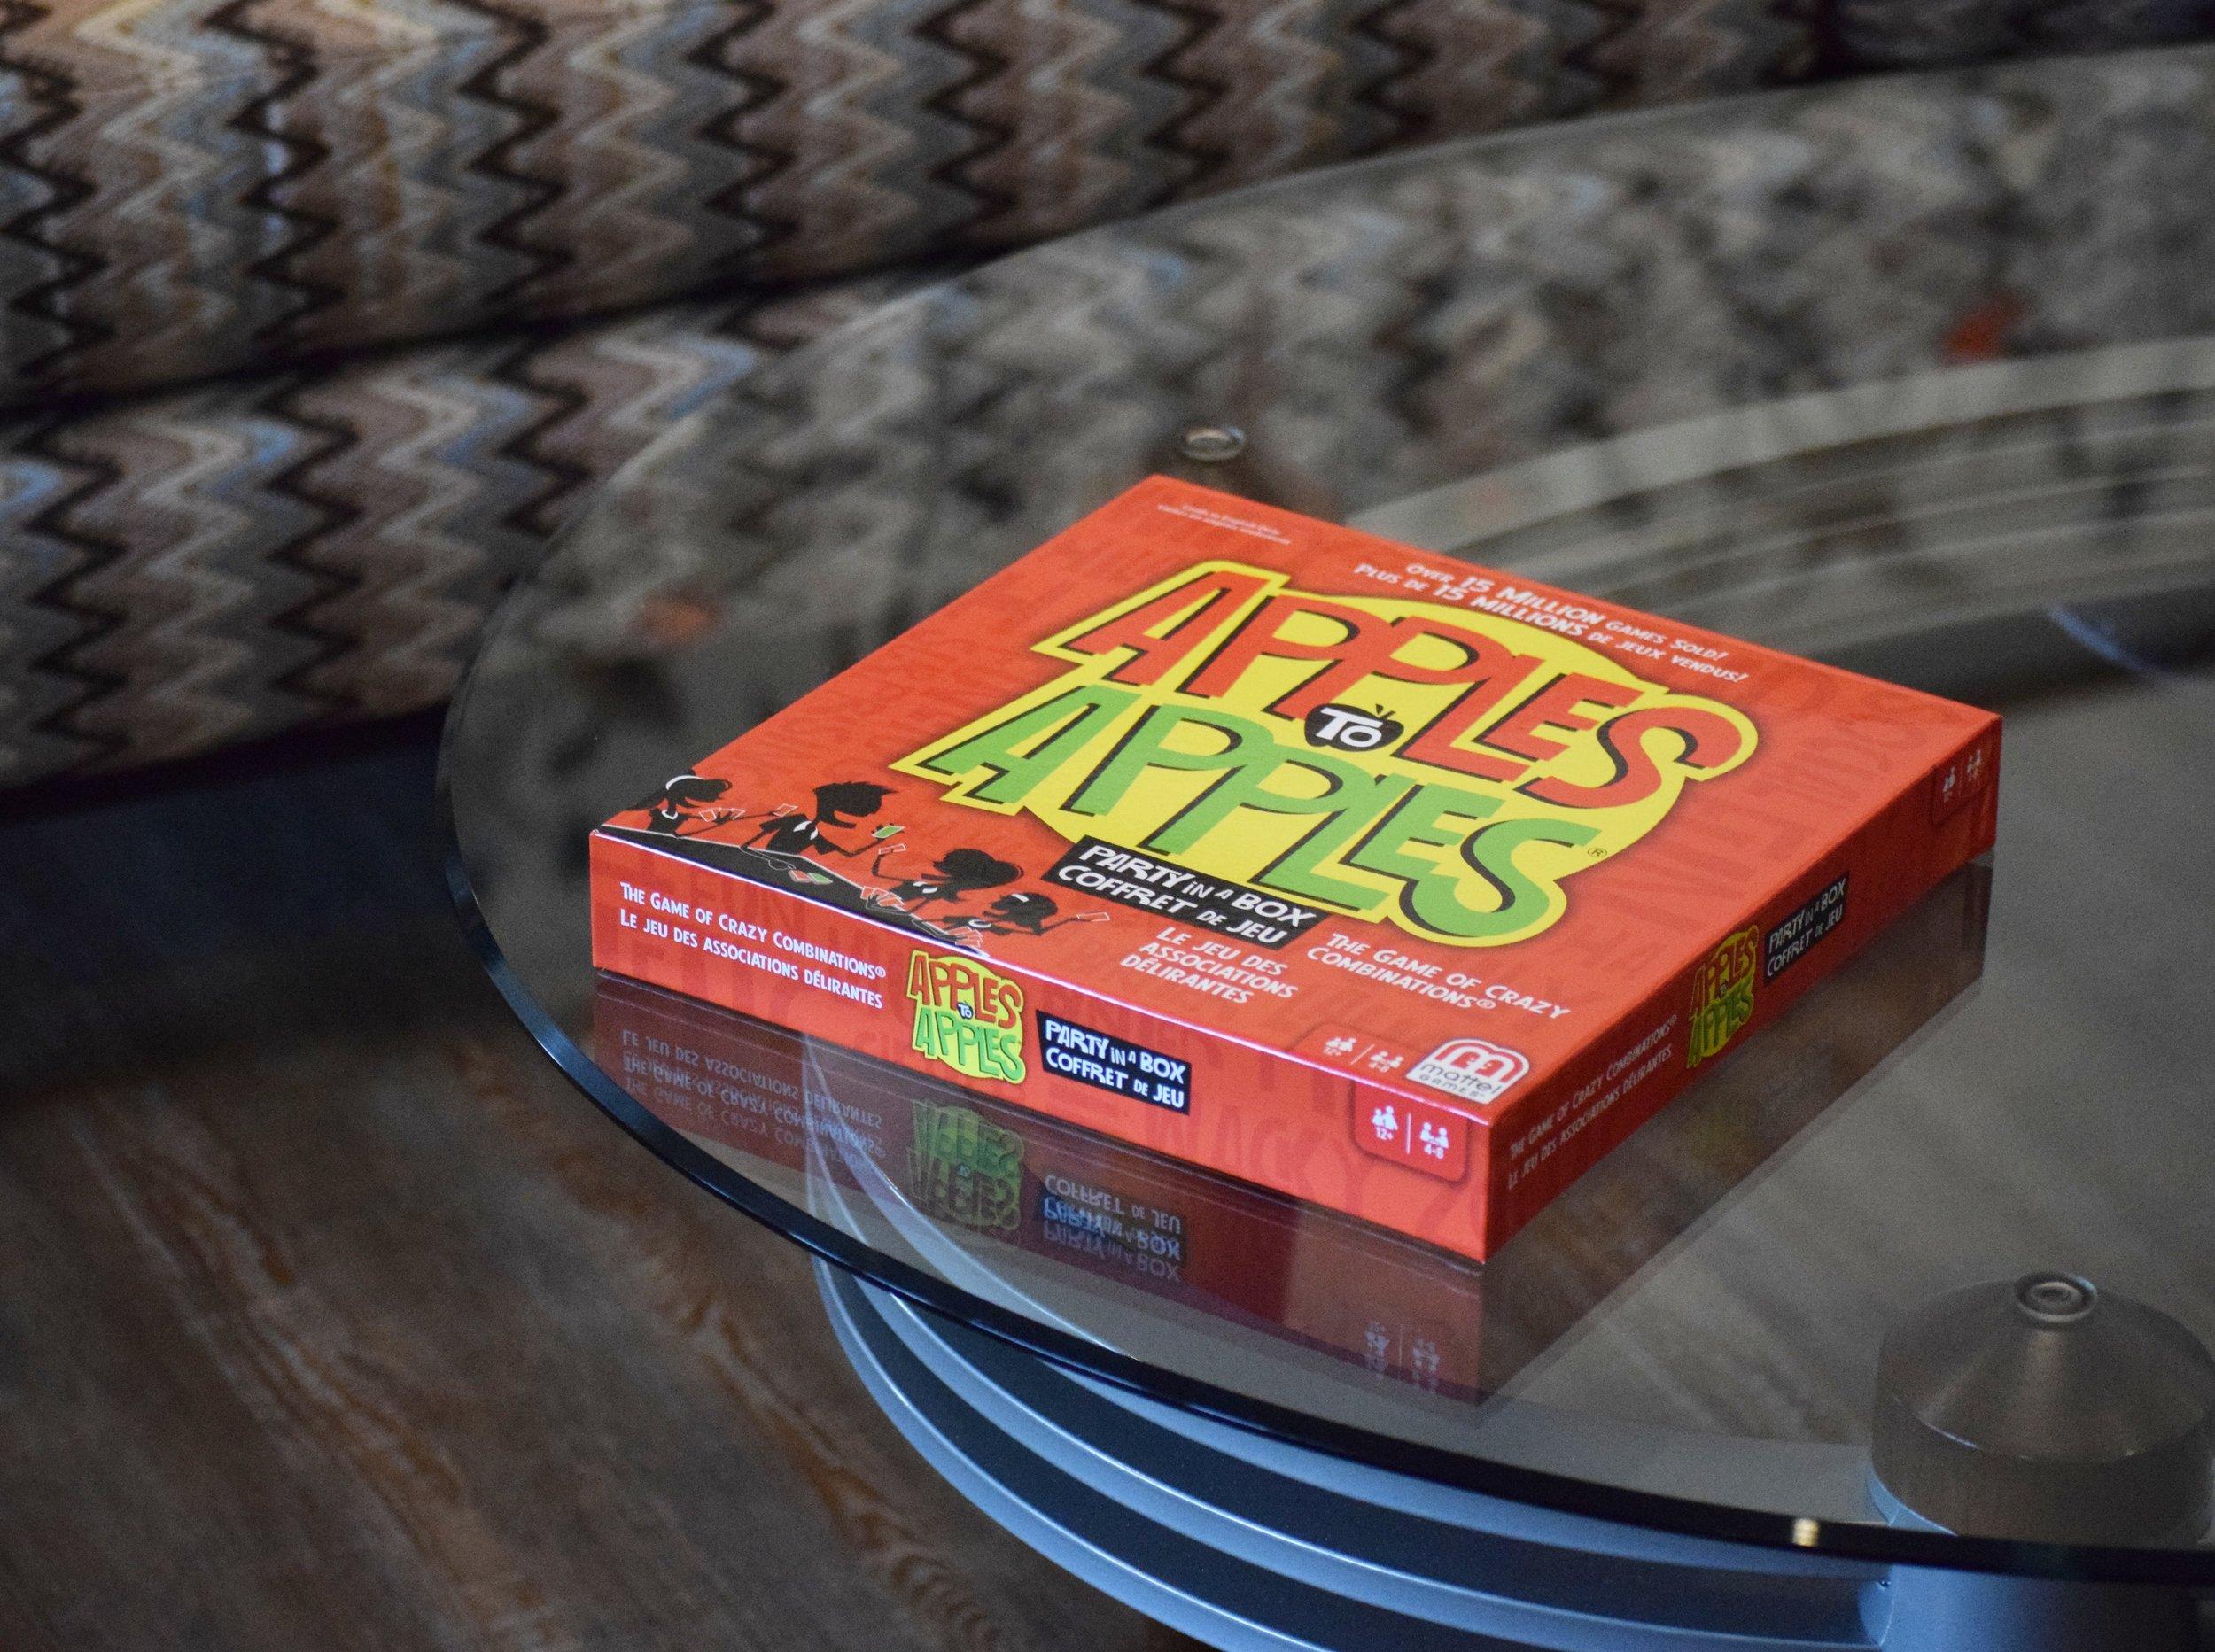 apples to apples boardgame.jpg